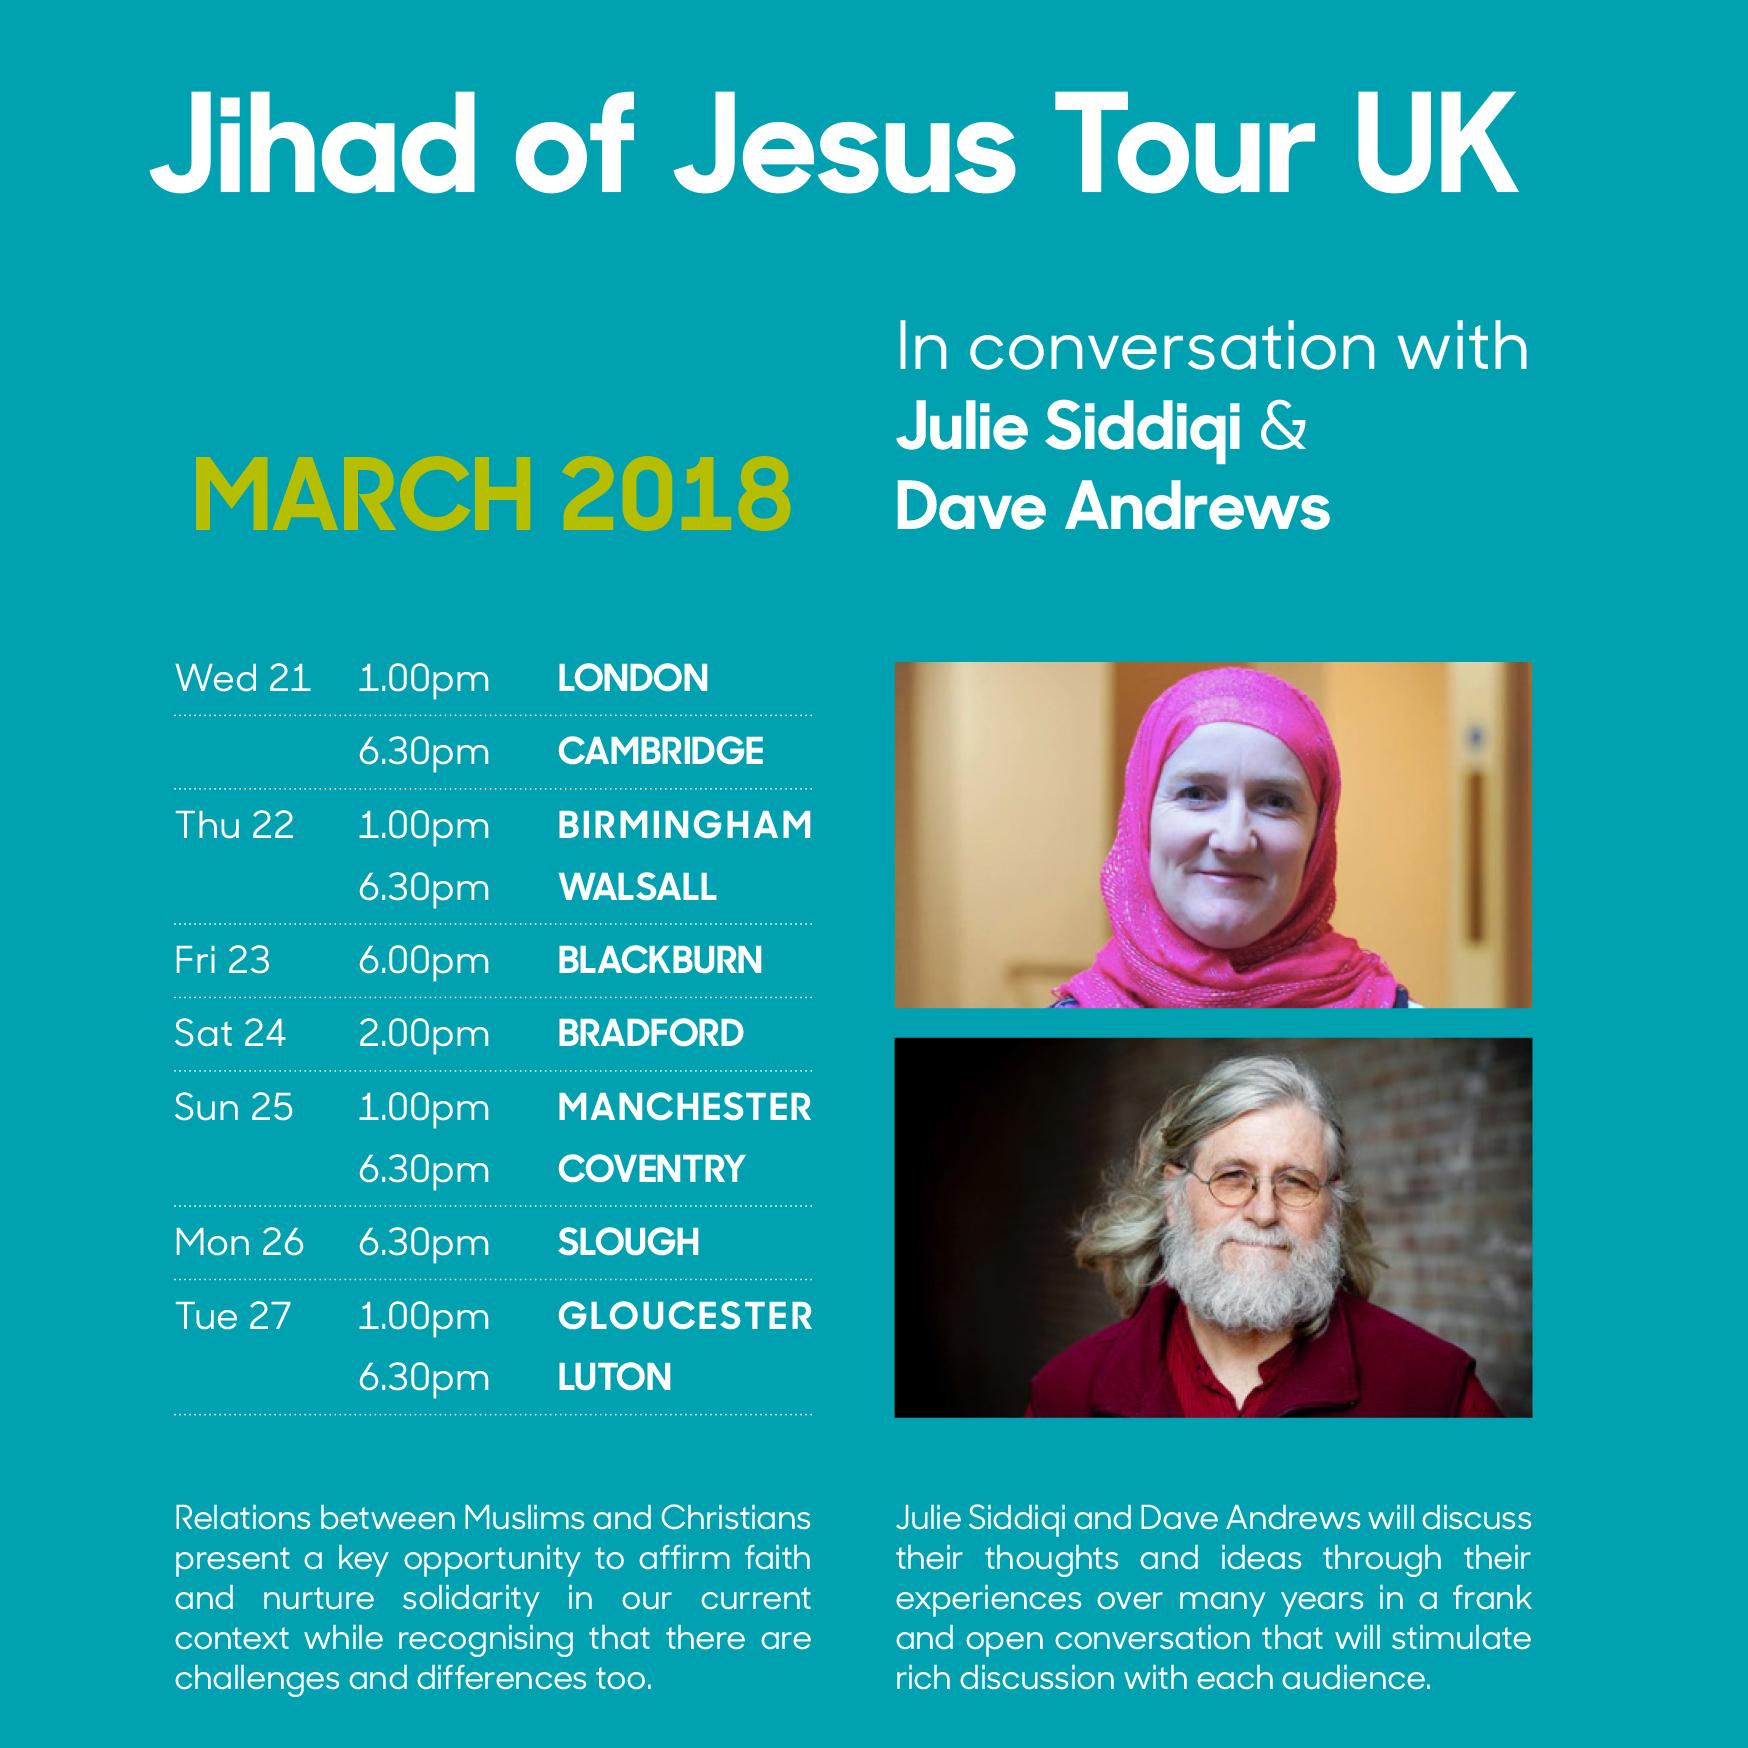 Jihad of Jesus